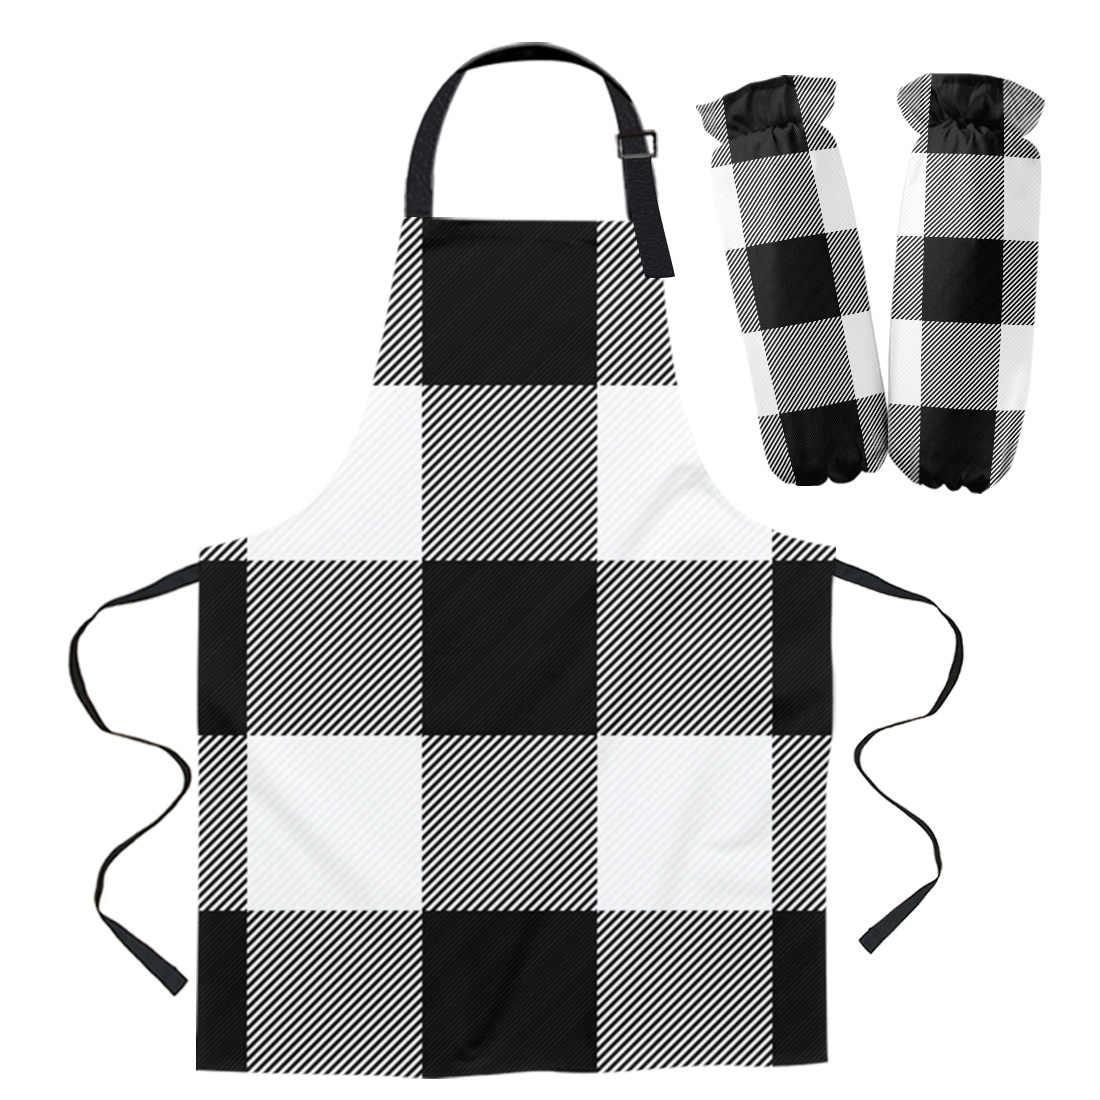 Black White Plaid Buffalo Check Kitchen Aprons Chef For Woman Kids Home Decor Apron Suit Gloves Cooking Baking Waist Bib Tool Aprons Aliexpress